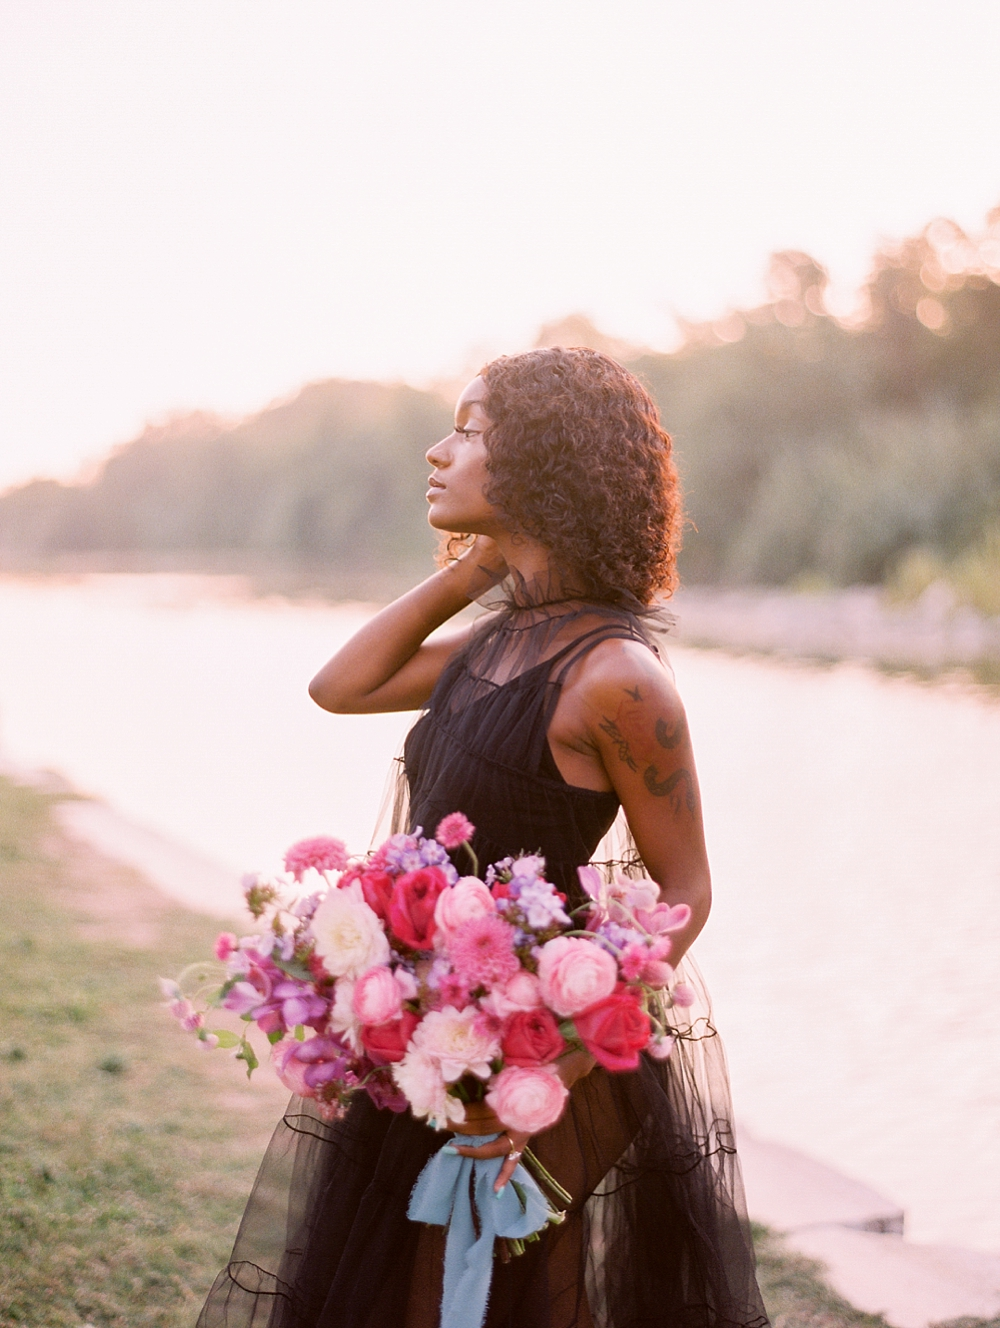 kristin-la-voie-photography-AUSTIN-wedding-BOUDOIR-photographer-63